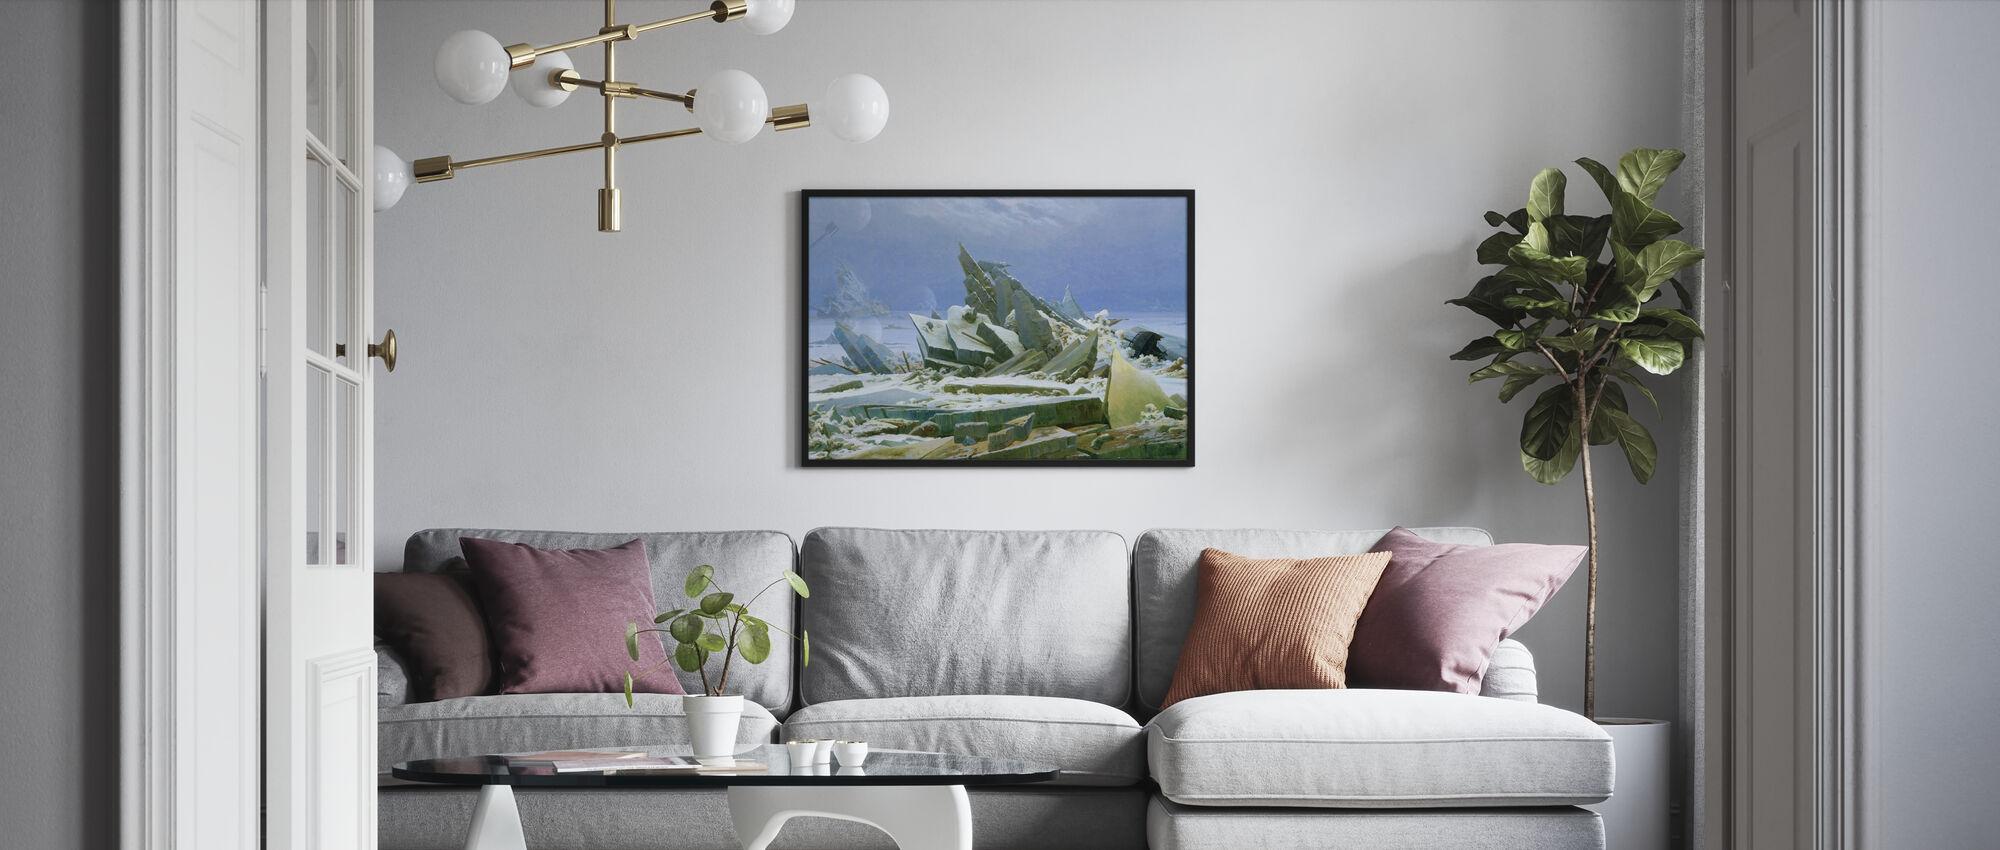 Polar Sea - Caspar Friedrich - Poster - Living Room